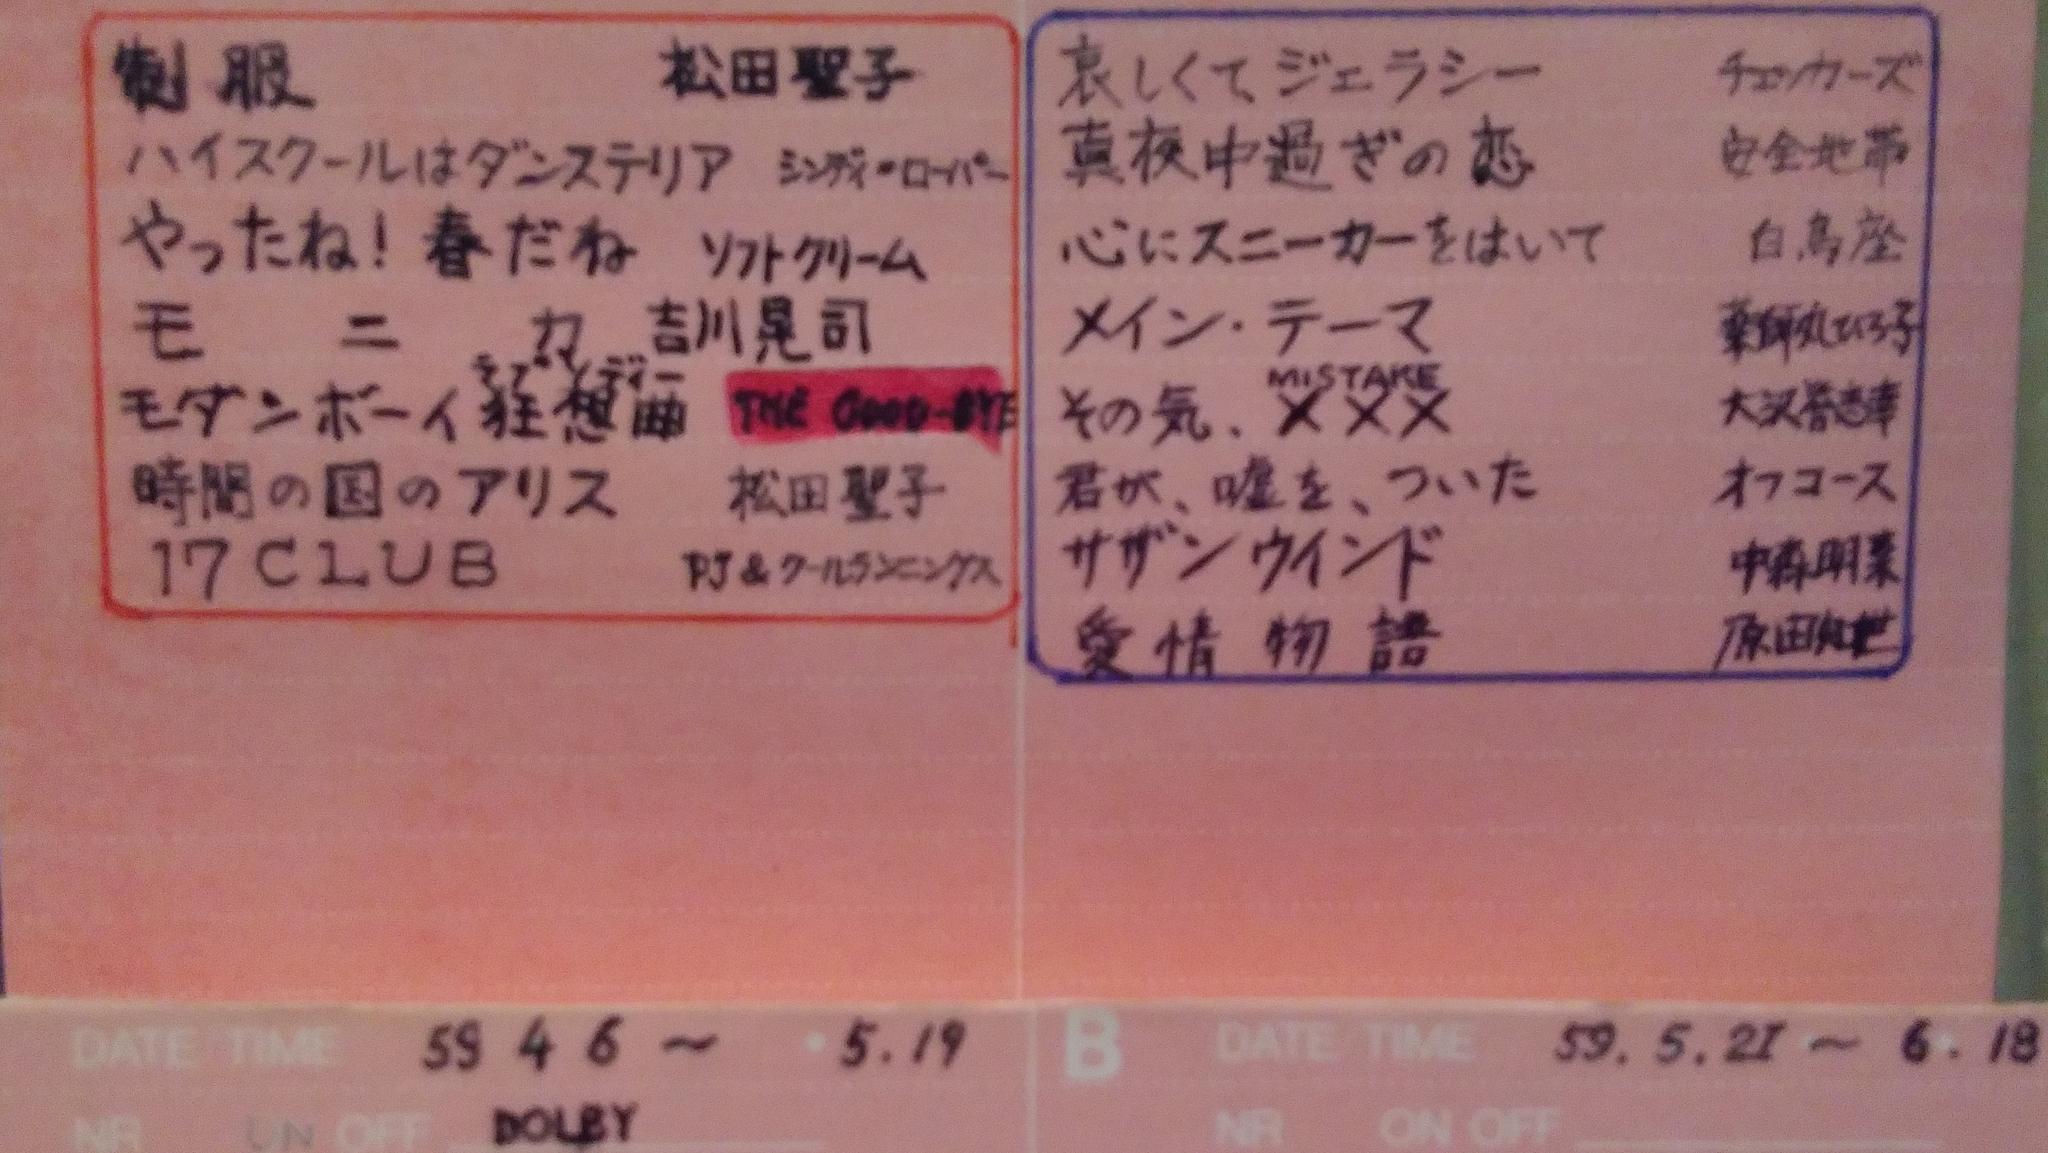 f:id:ToshUeno:20150425182940j:plain